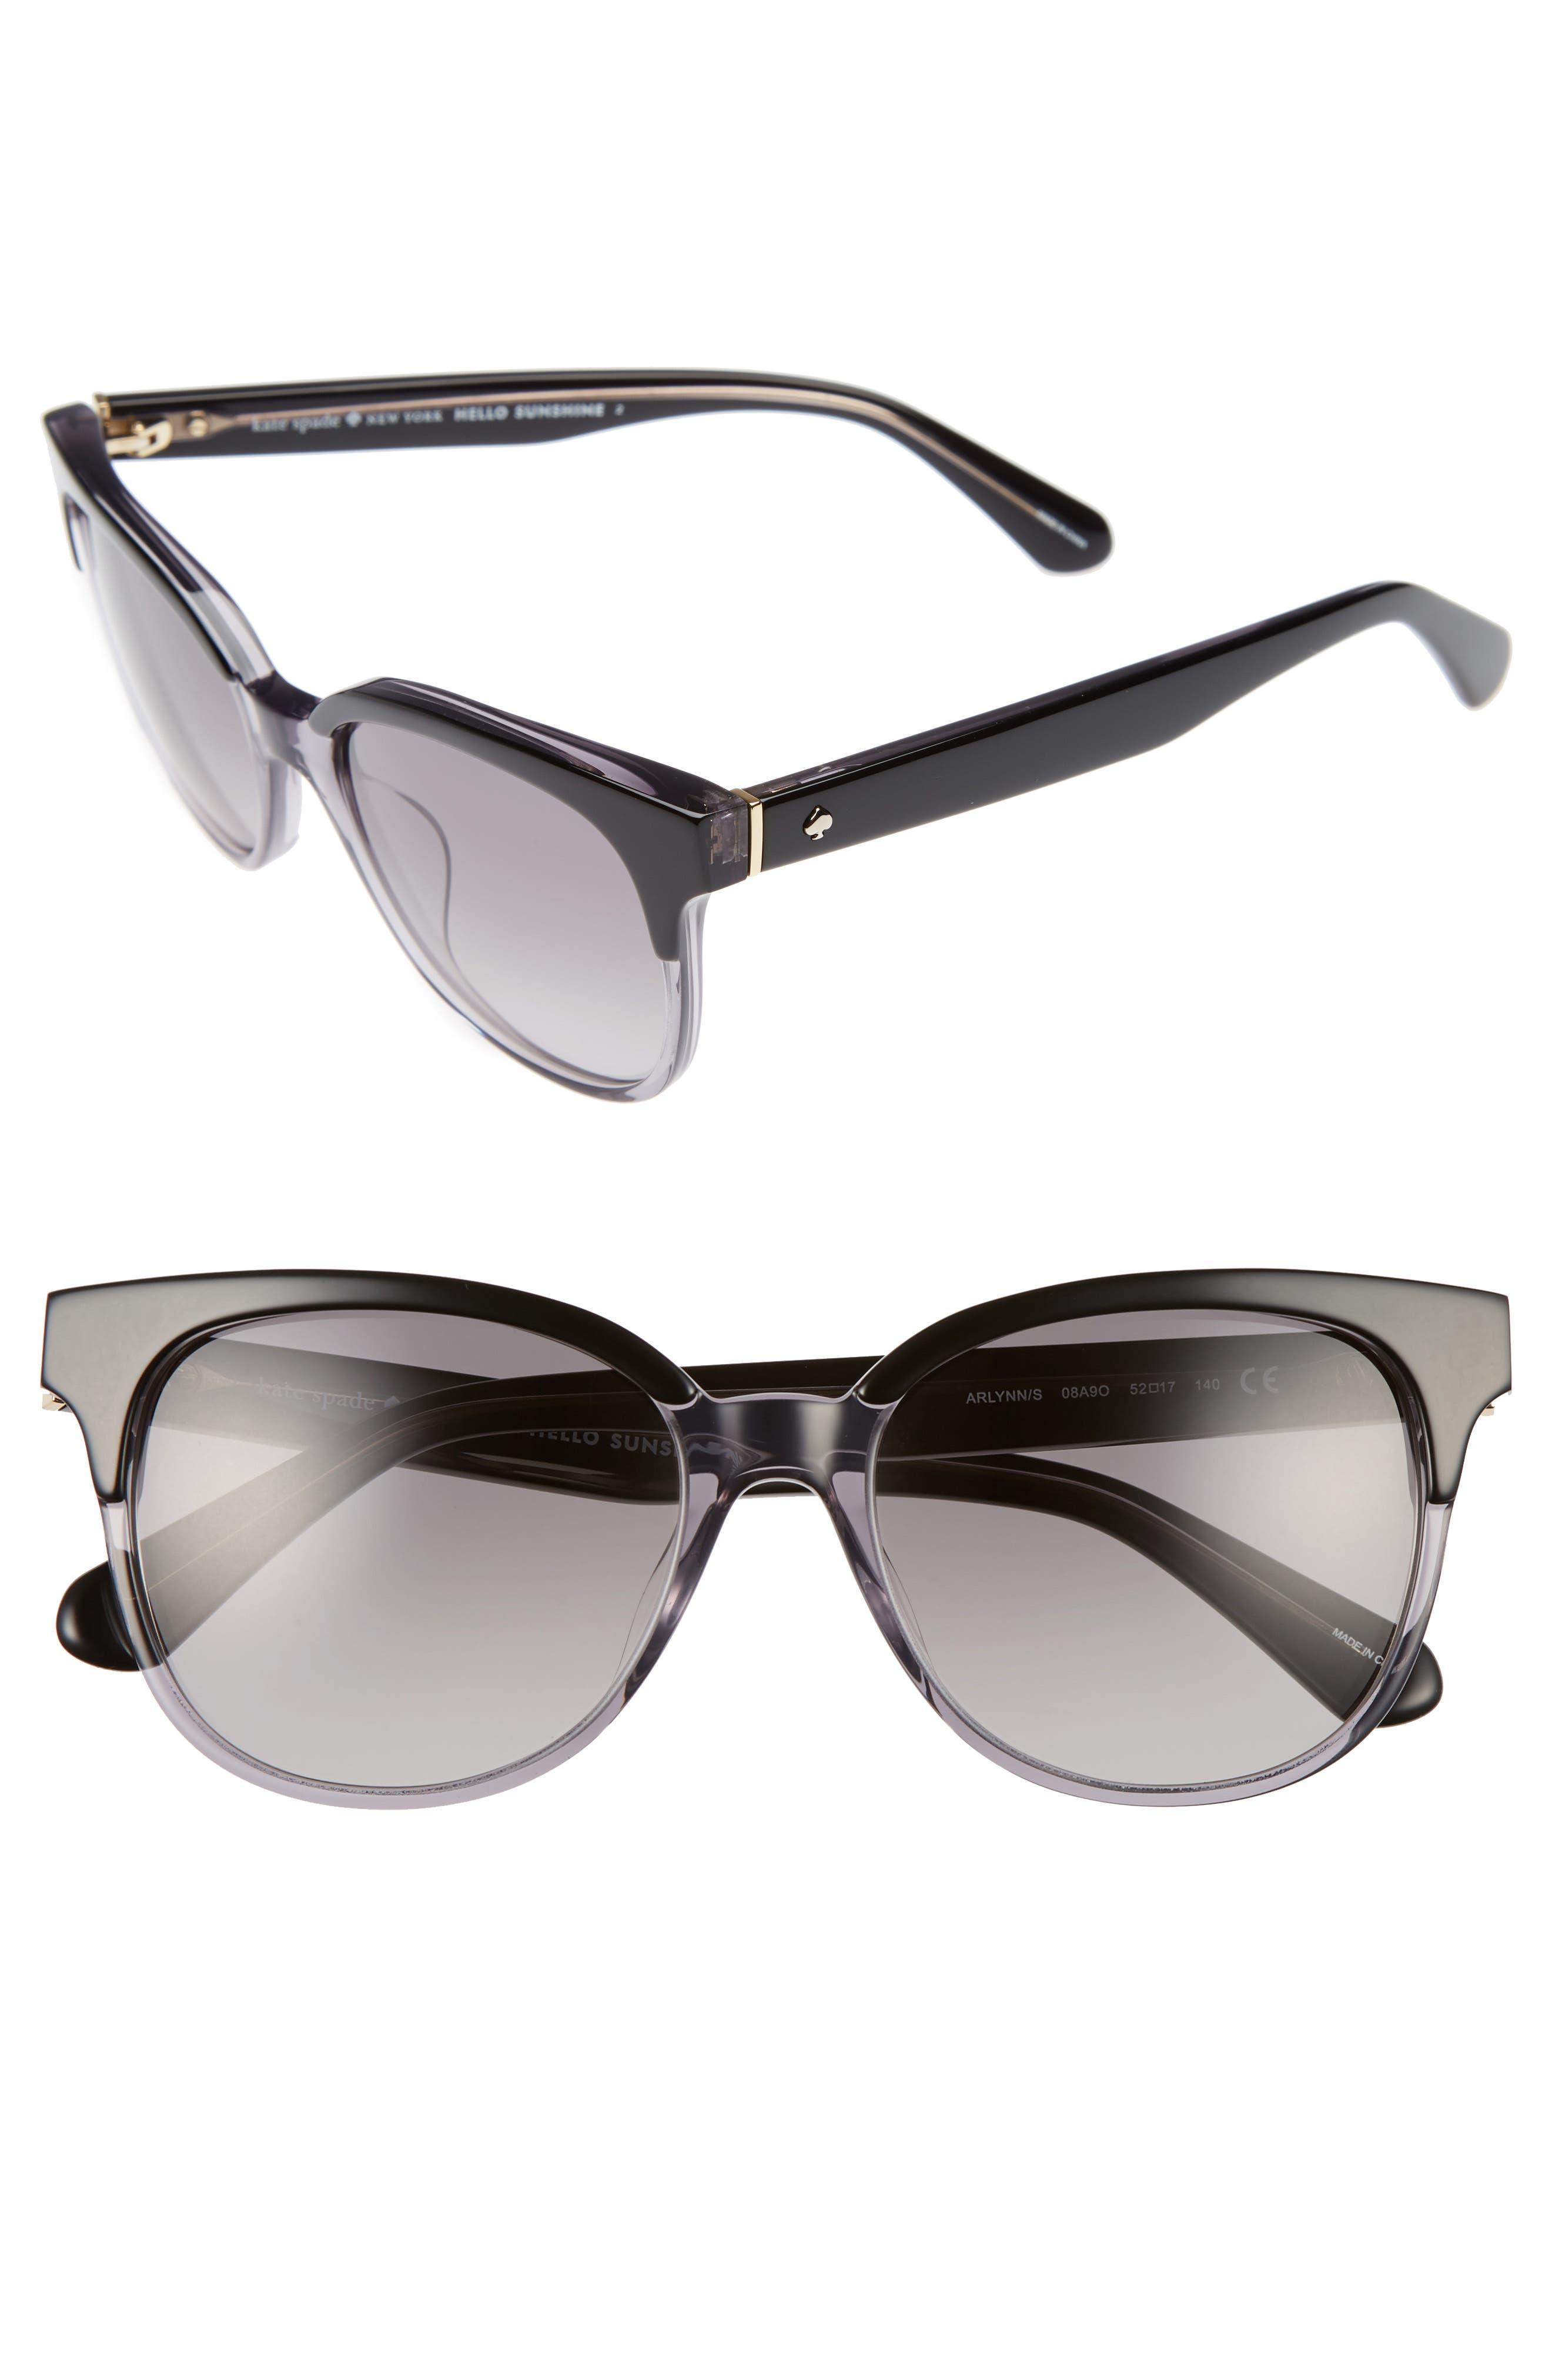 KATE SPADE NEW YORK, arlynn 52mm sunglasses, Main thumbnail 1, color, 001